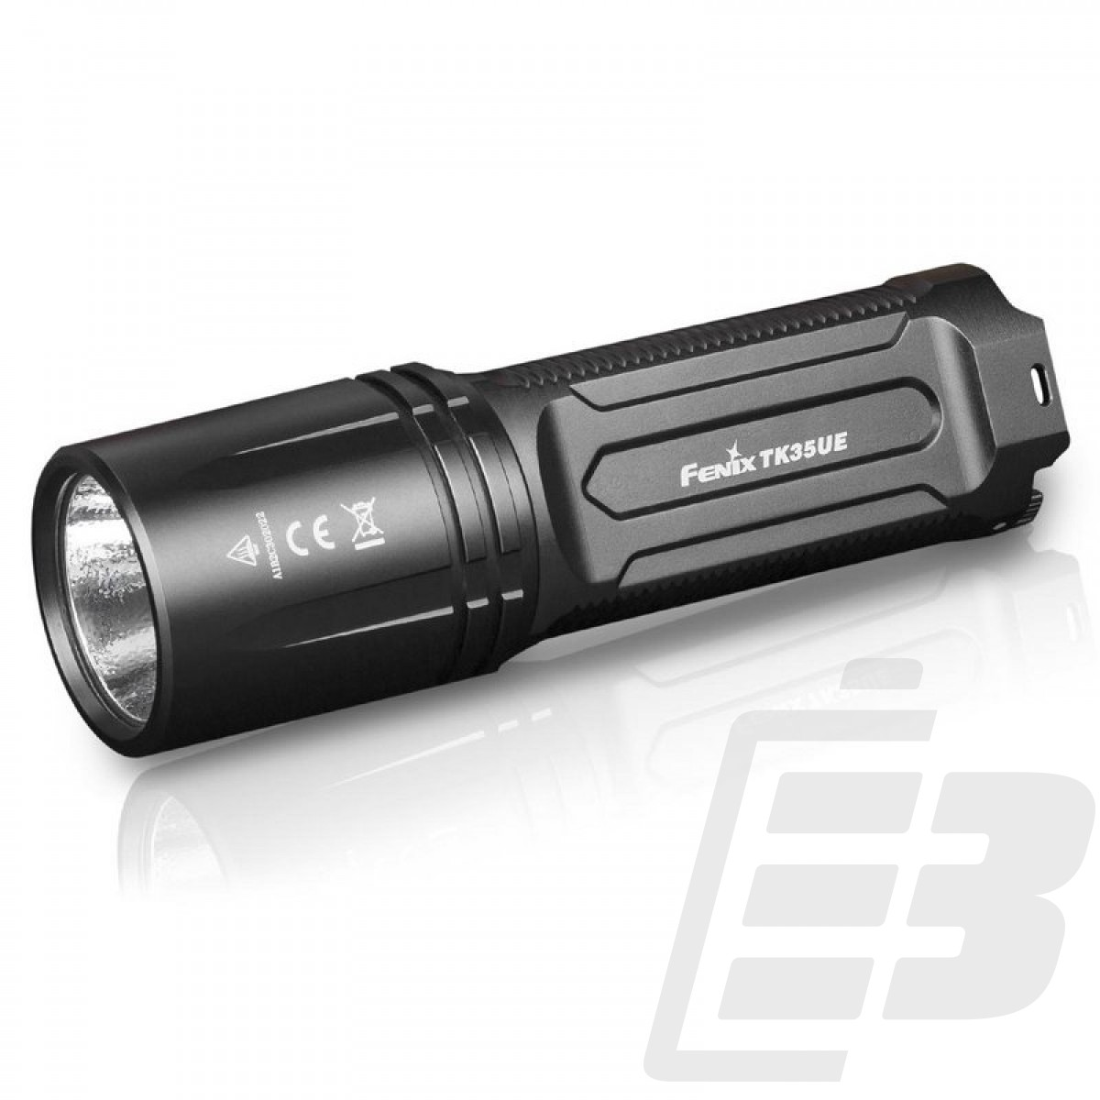 Fenix TK35 LED Flashlight 2018 Edition 1